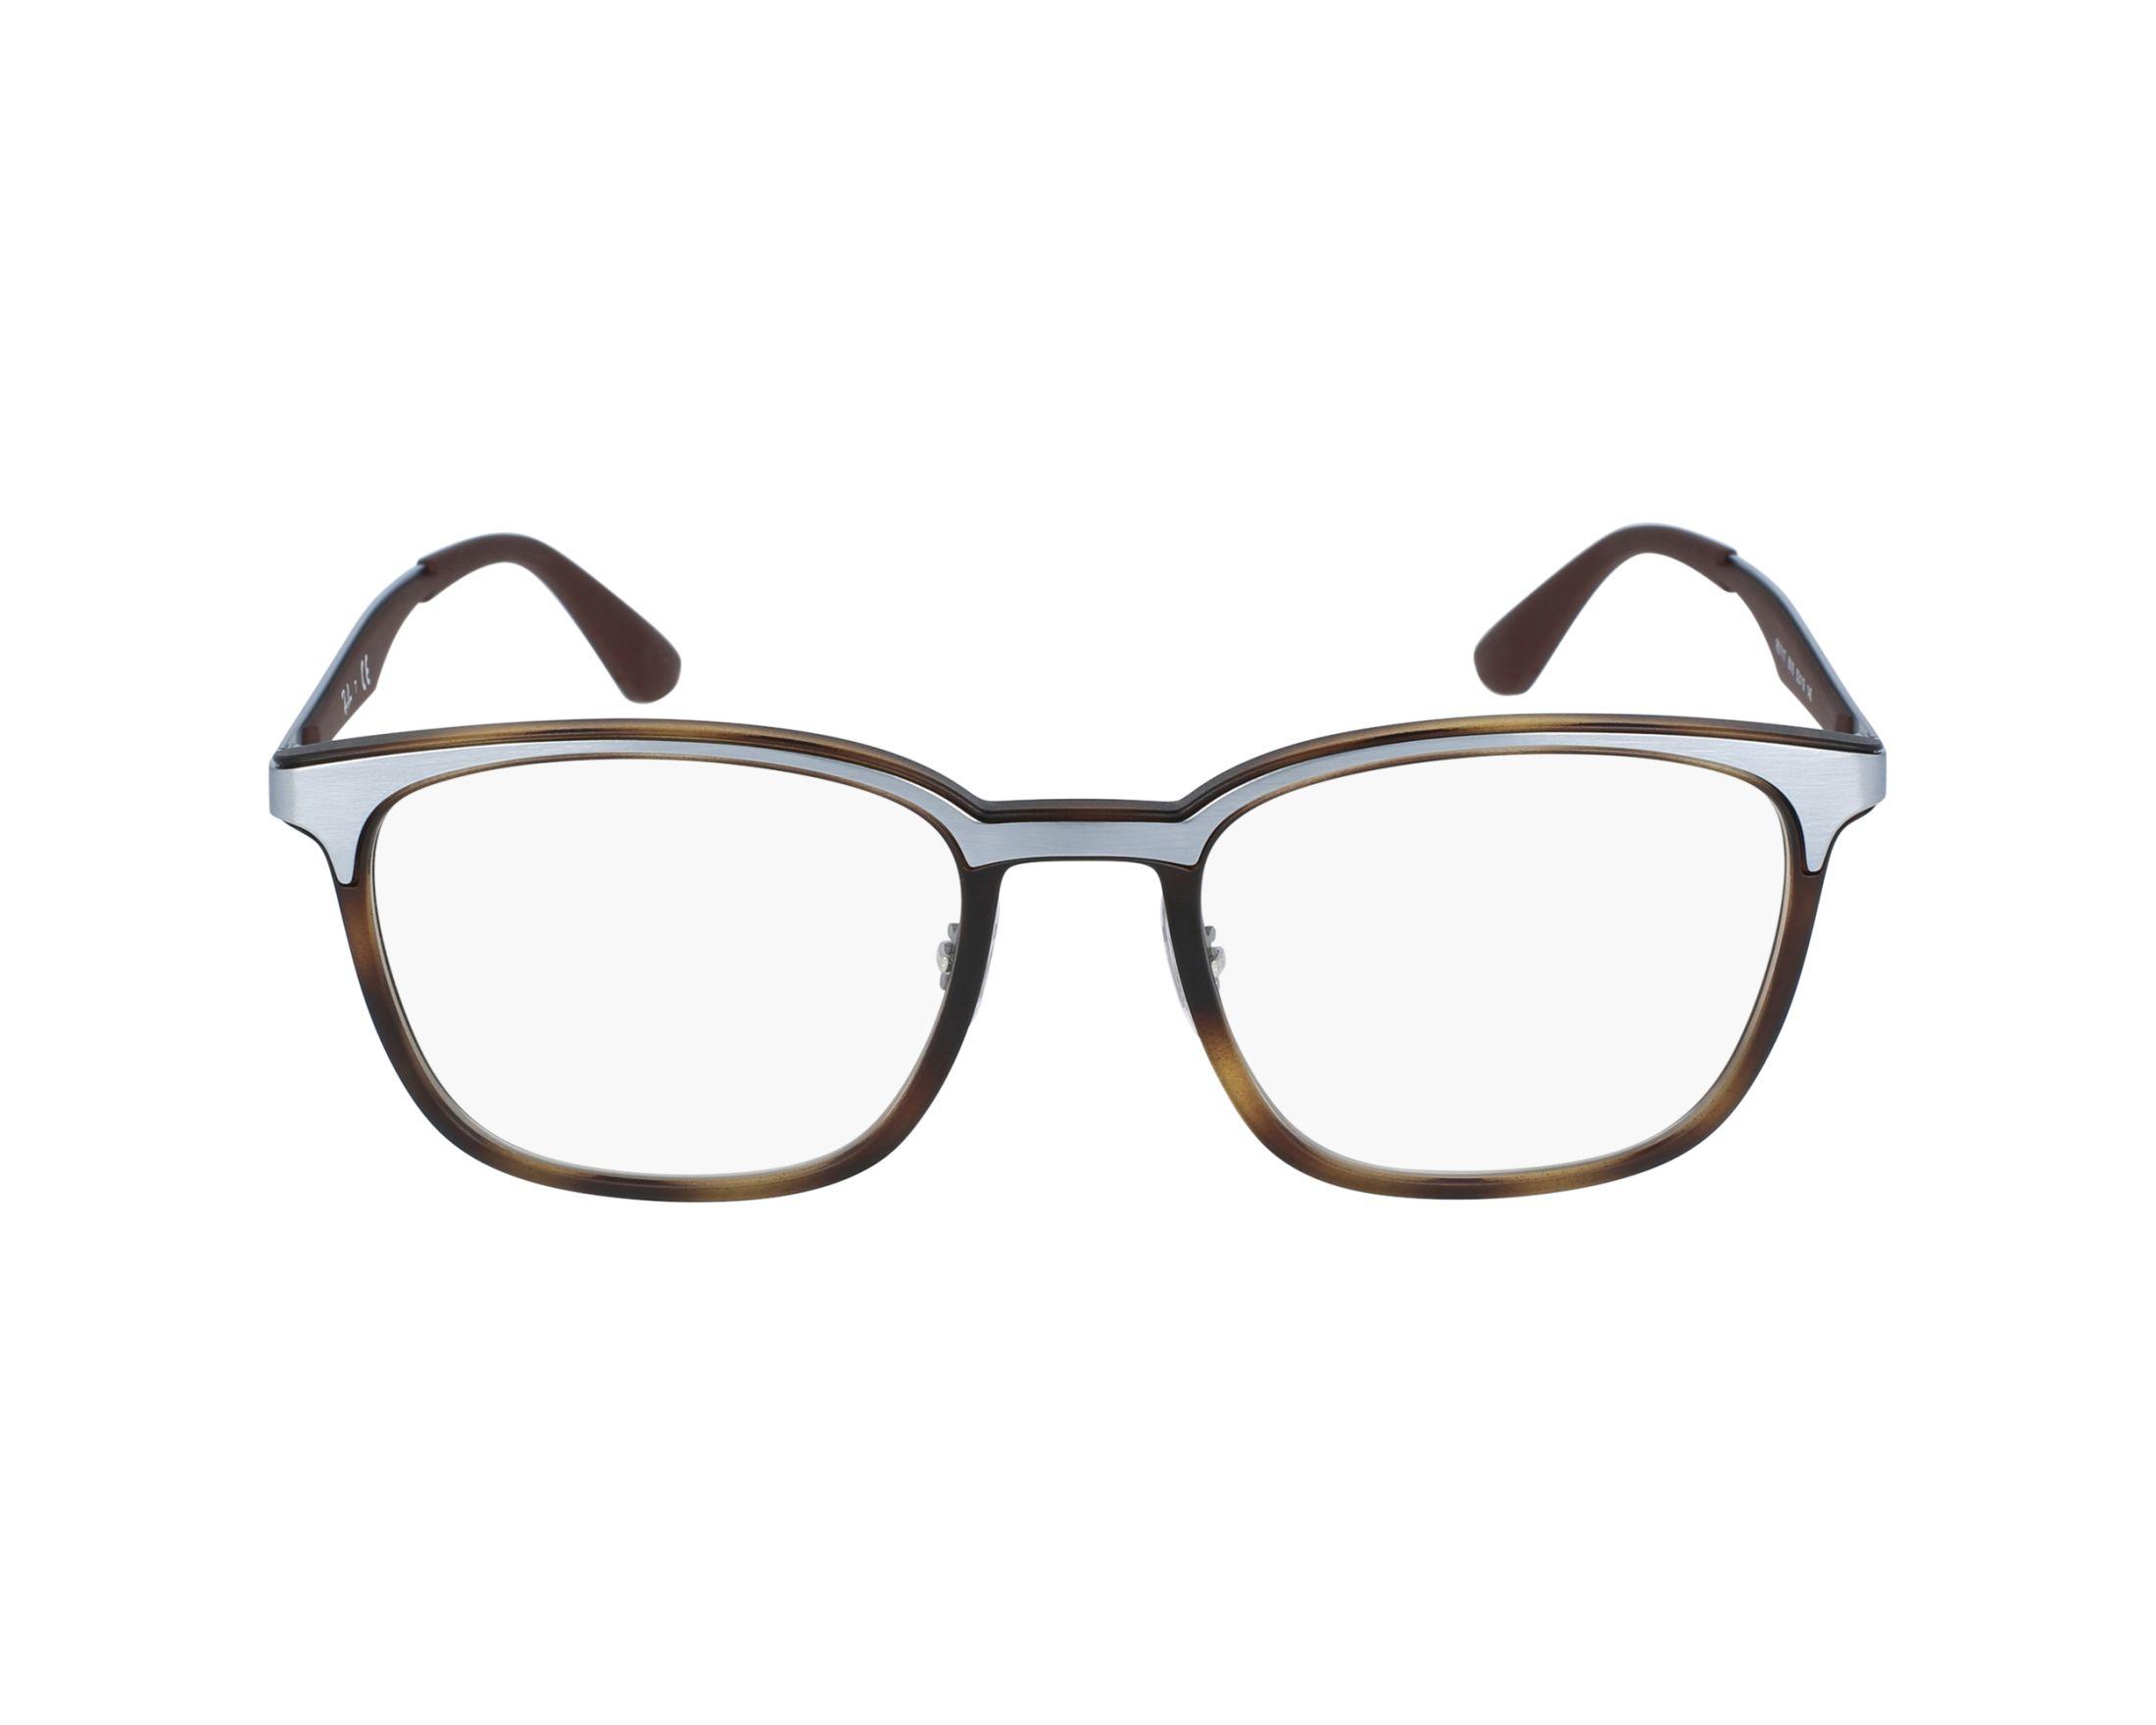 aeb6dff959 eyeglasses Ray-Ban RX-7117 8016 52-19 Havana Brown profile view